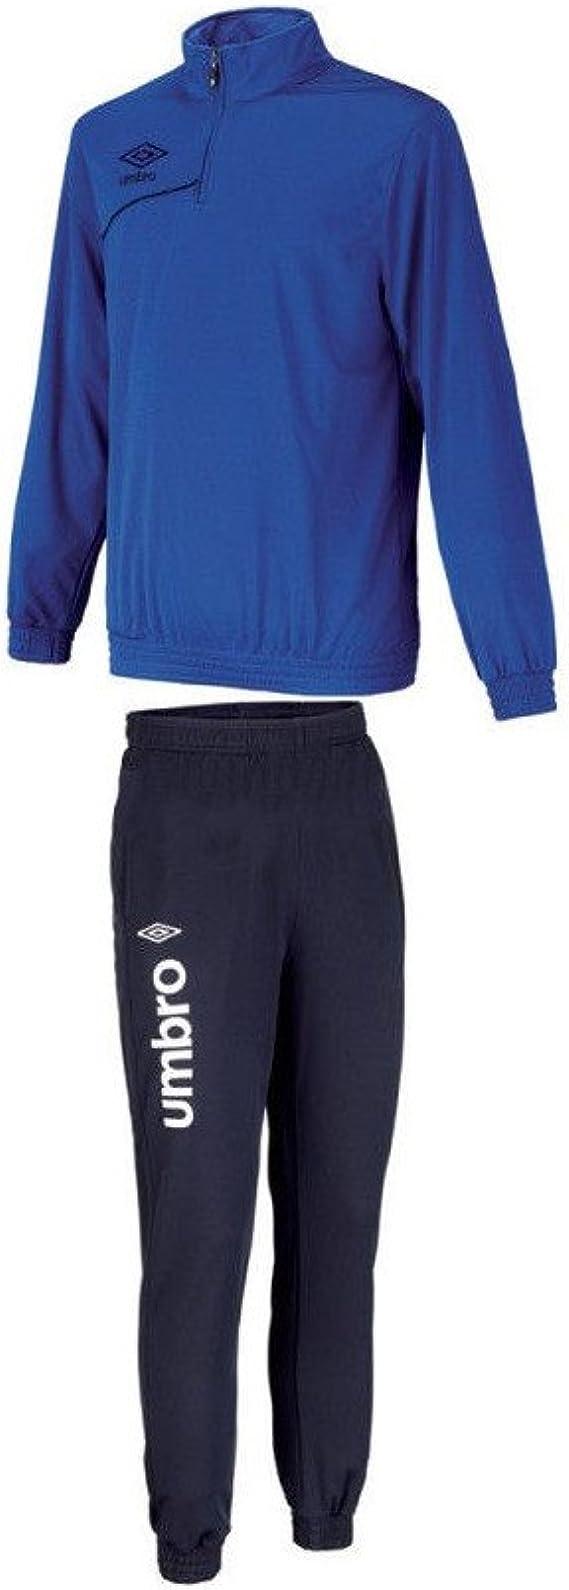 Umbro - Chándal - para Hombre Azzurro\BLU Medium: Amazon.es: Ropa ...